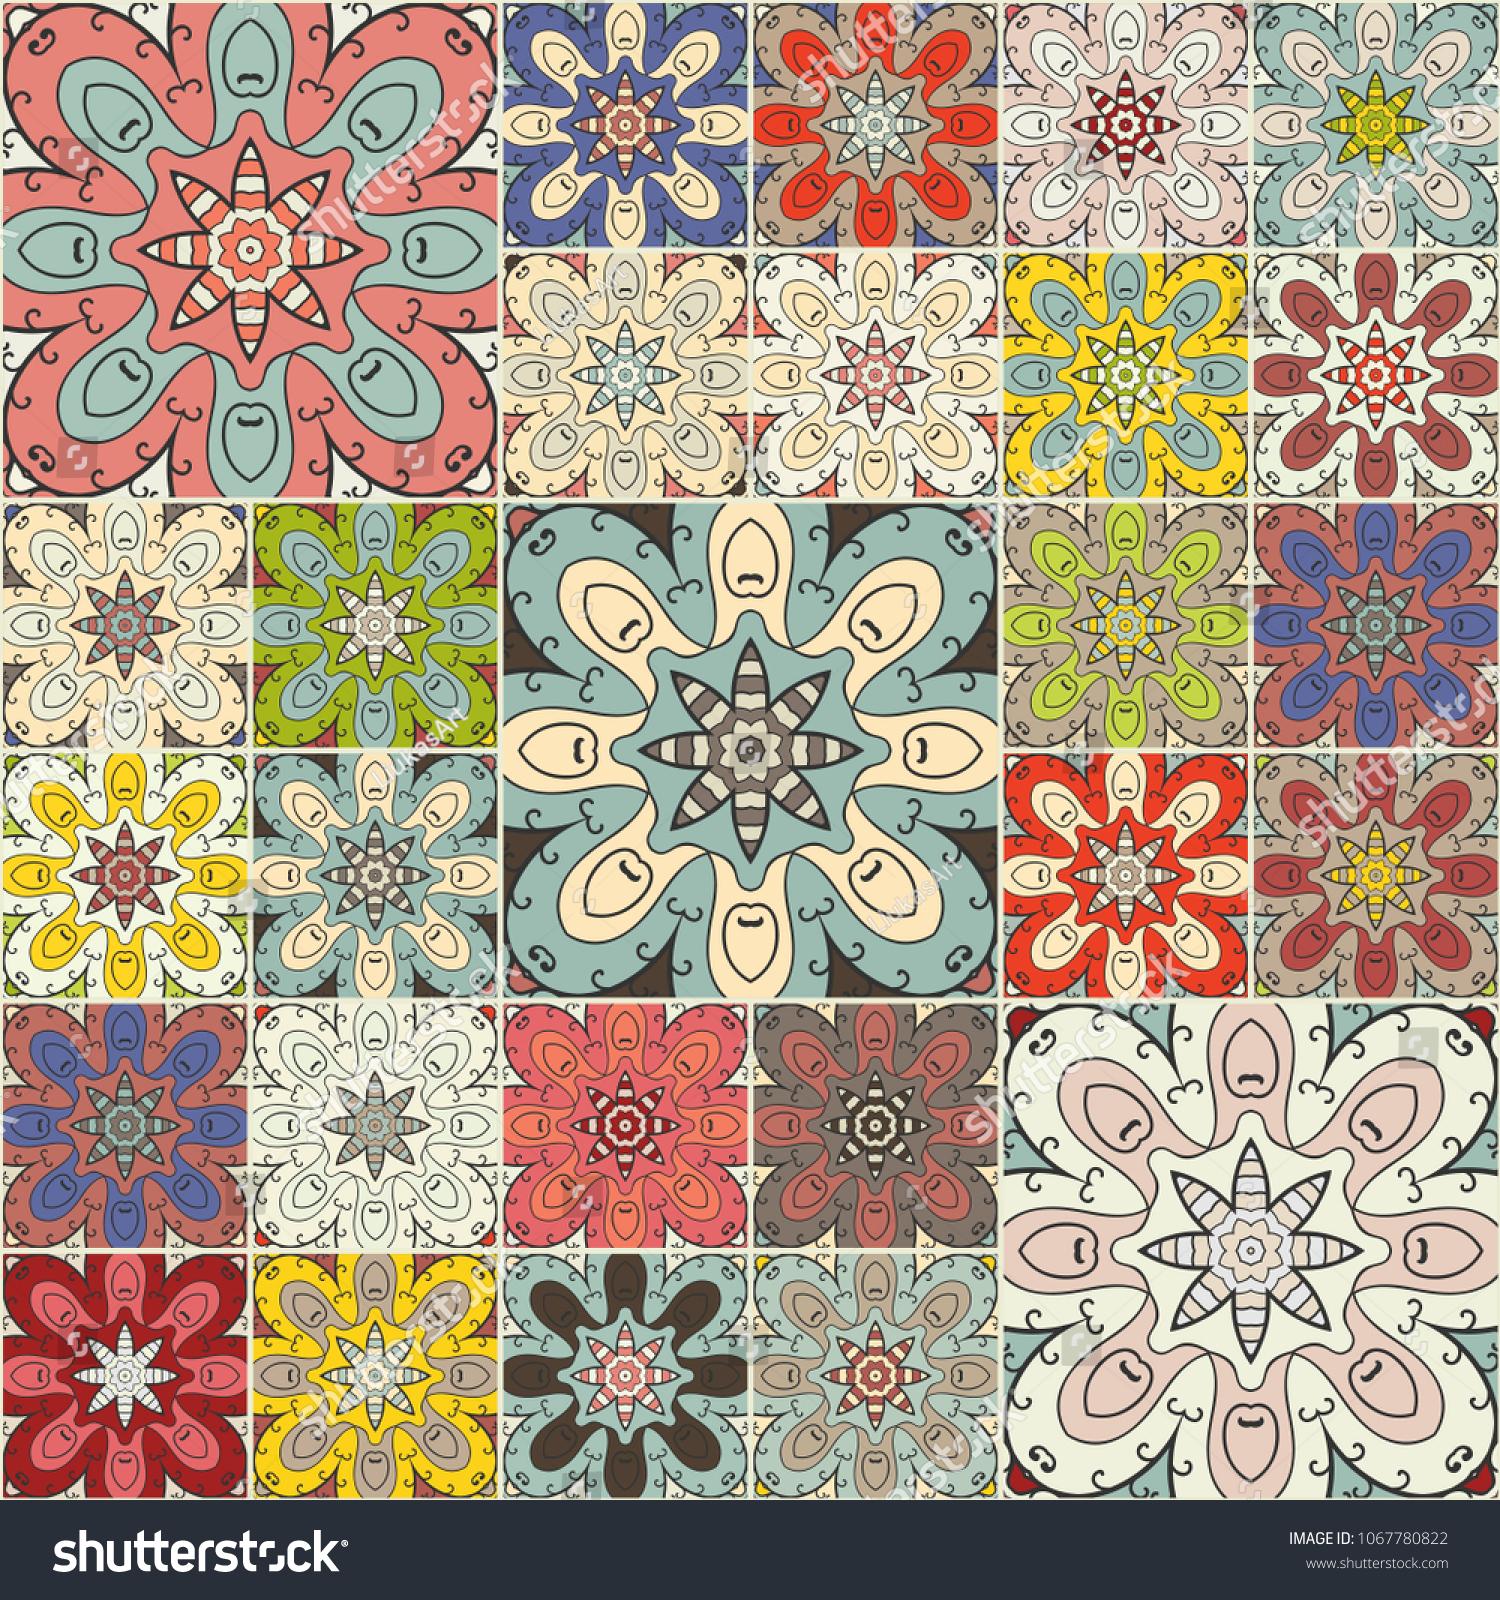 Vector Patchwork Quilt Pattern Vintage Decorative Elements Hand Drawn Background